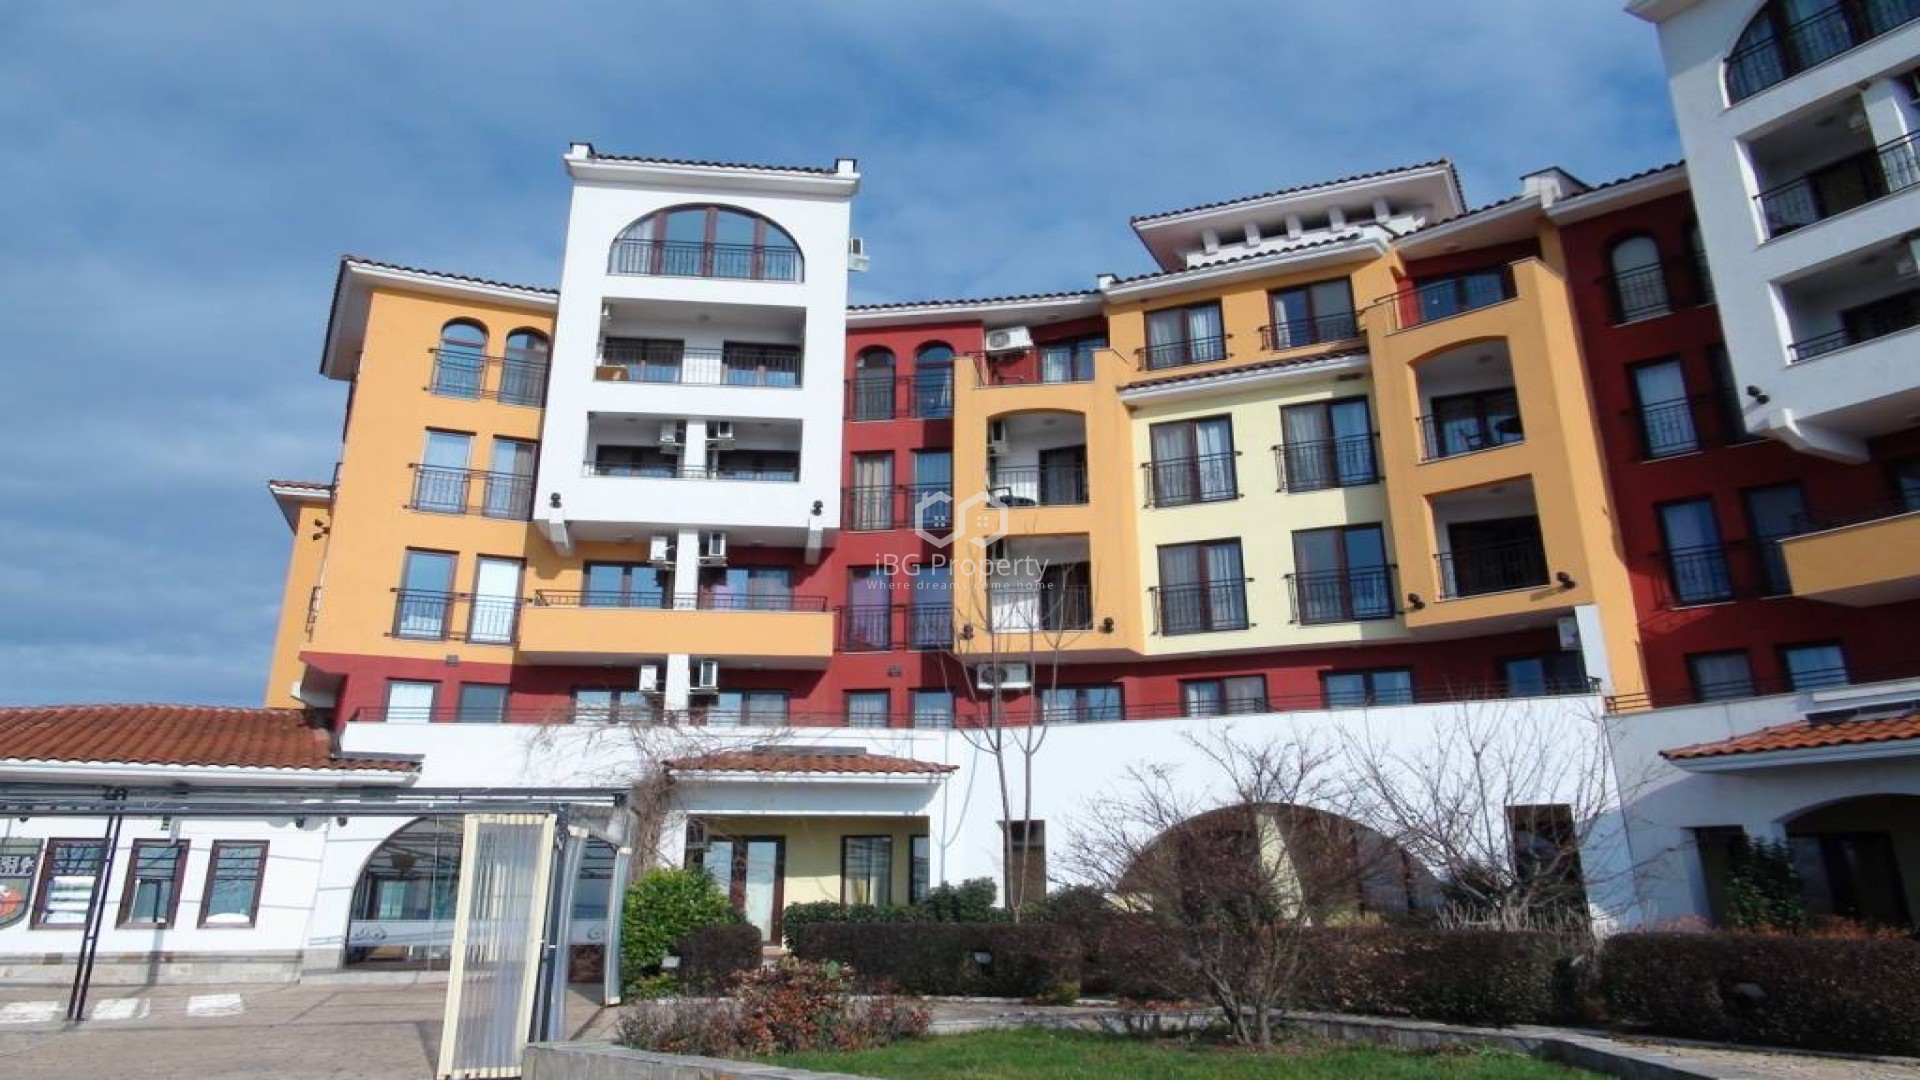 Maisonette Aheloy 184 m2